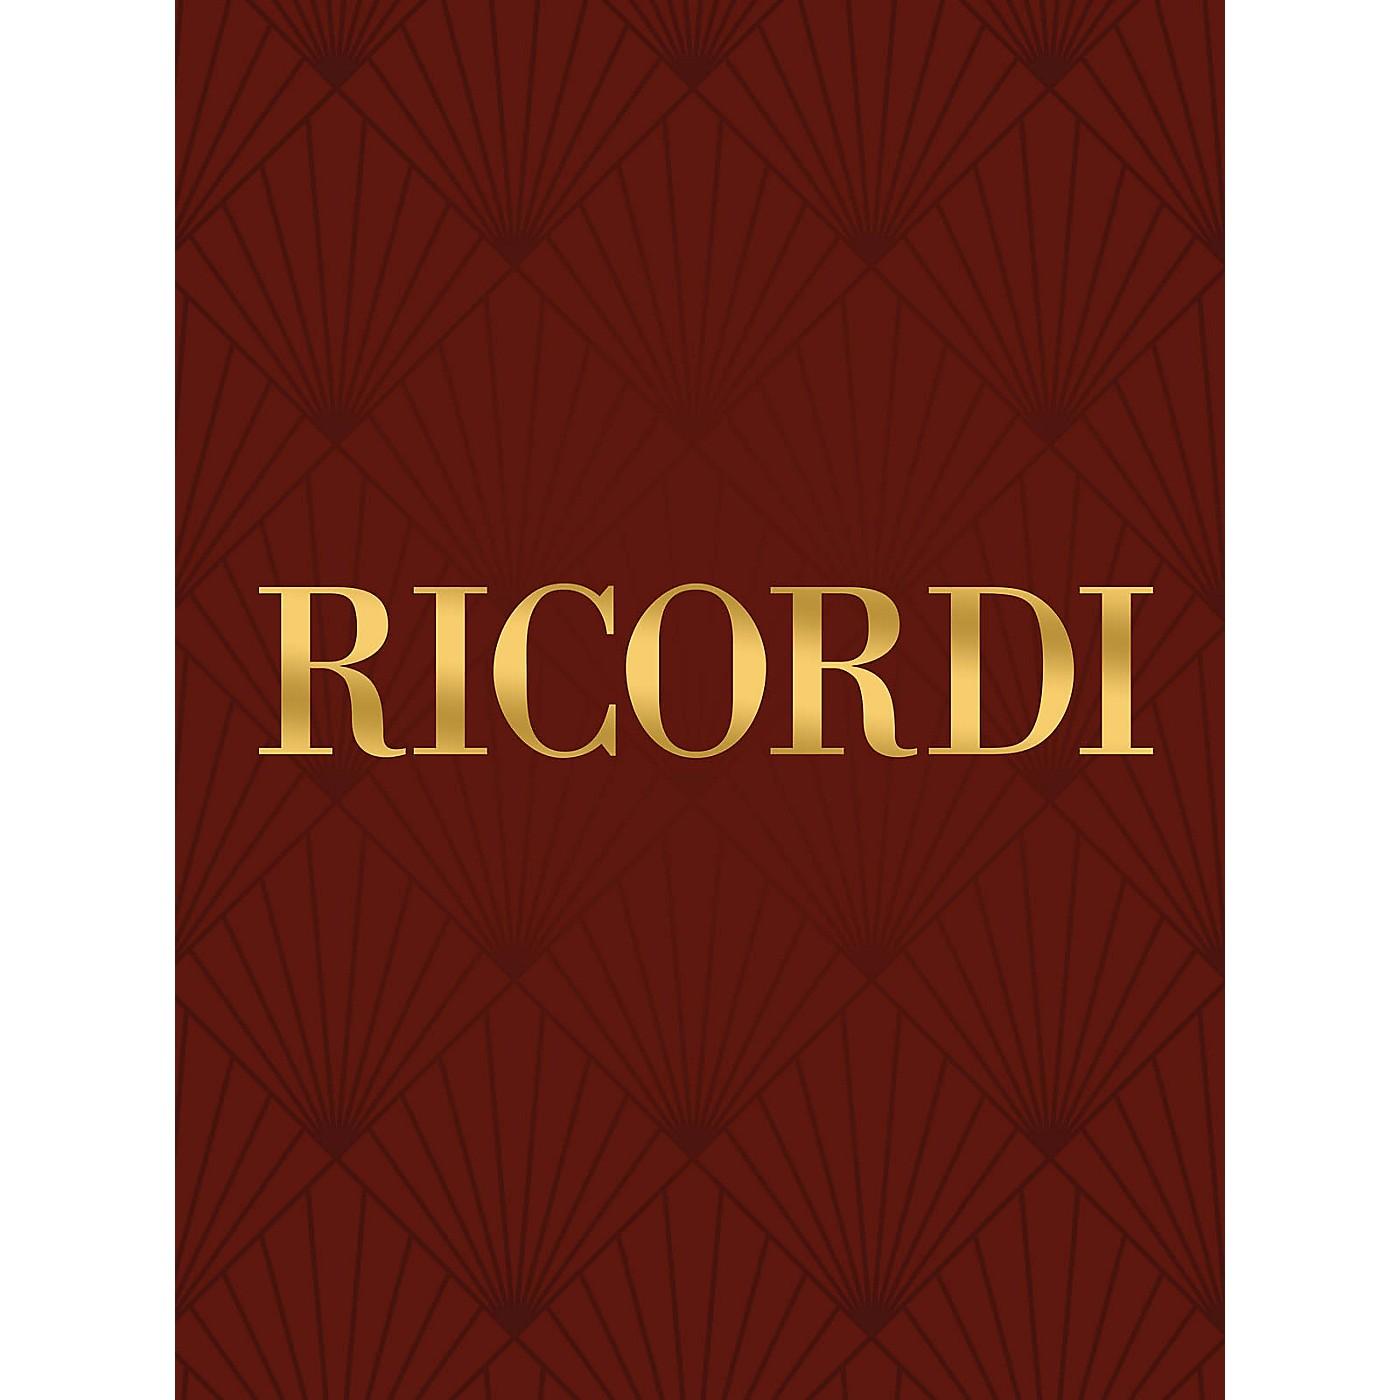 Ricordi Confitebor Tibi Domine Lat/En Vocal Score Composed by Giovanni Pergolesi Edited by Francesco Degrada thumbnail